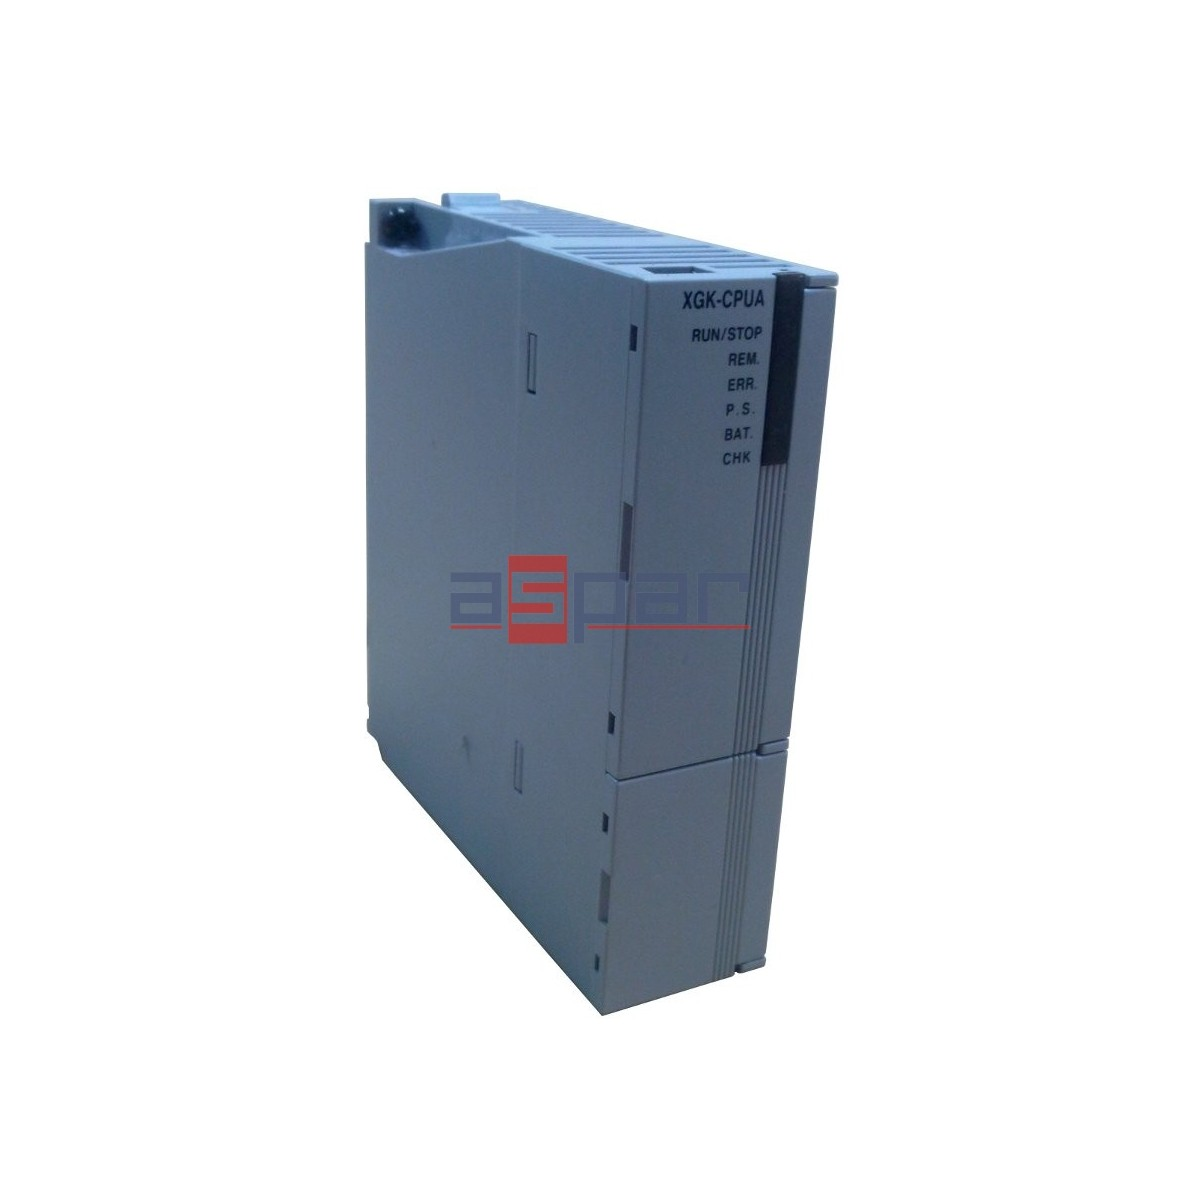 XGK-CPUA - jednostka CPU zawansowana